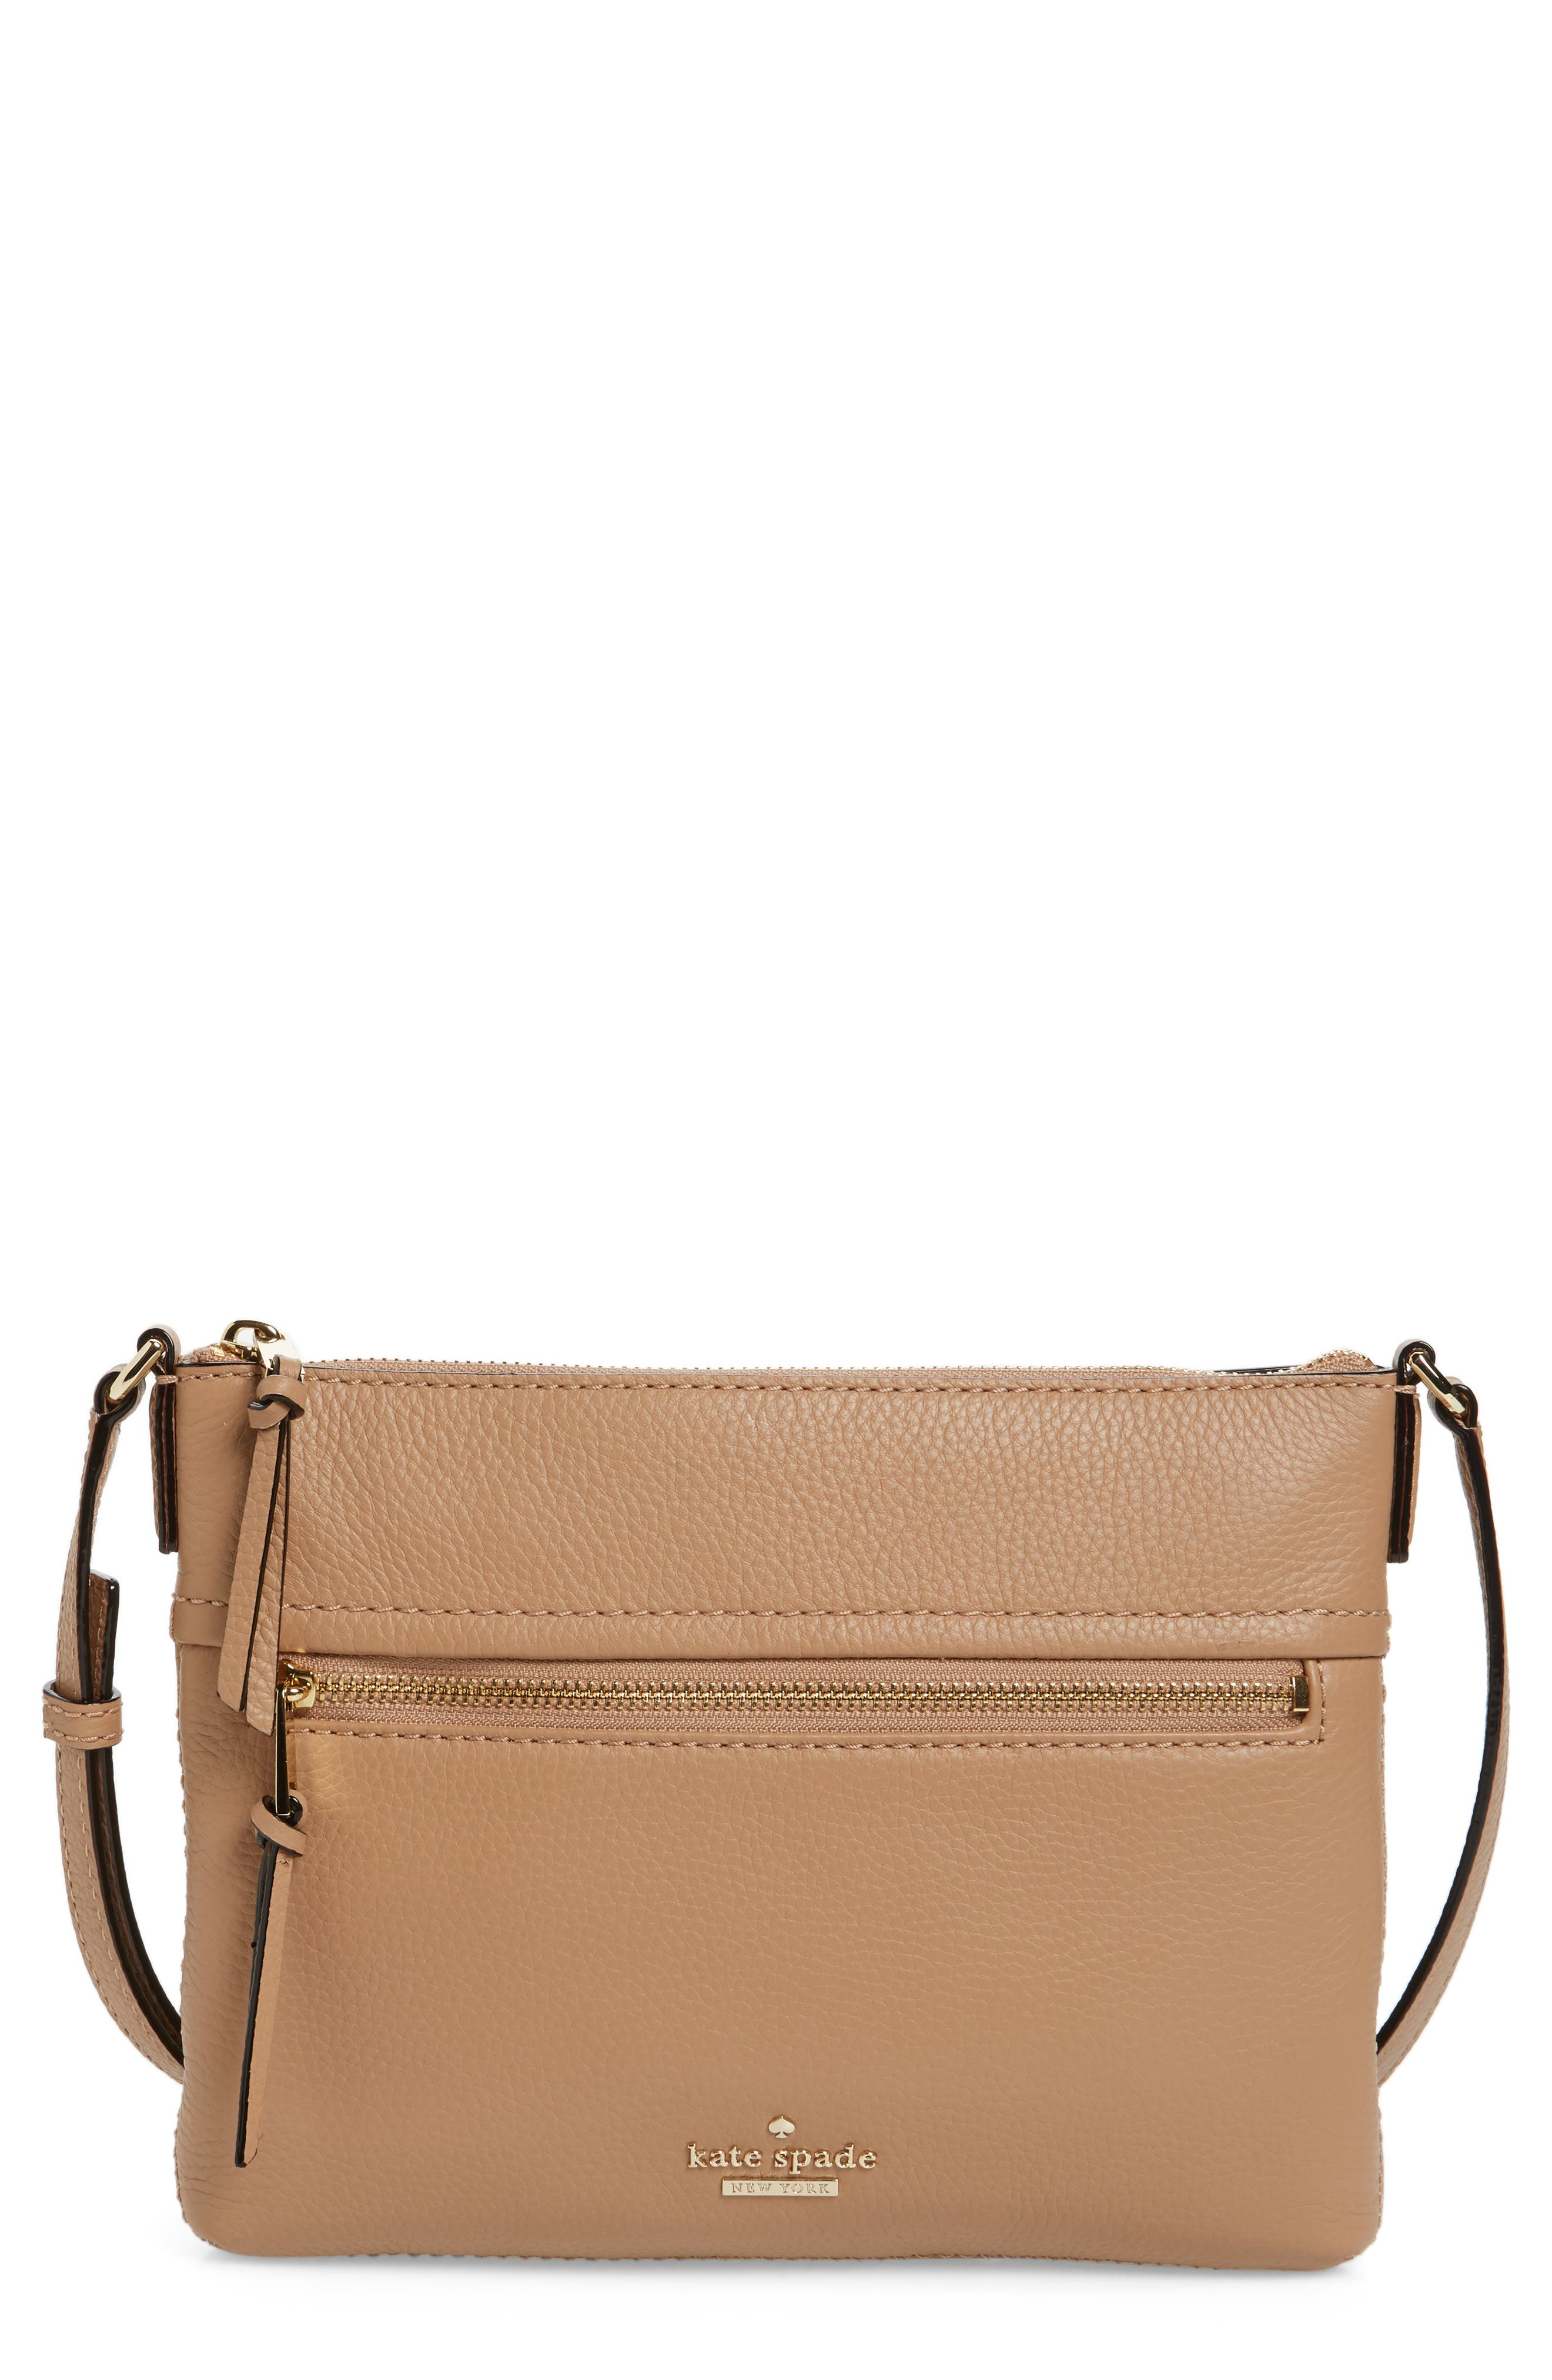 kate spade new york jackson street - gabriele leather crossbody bag